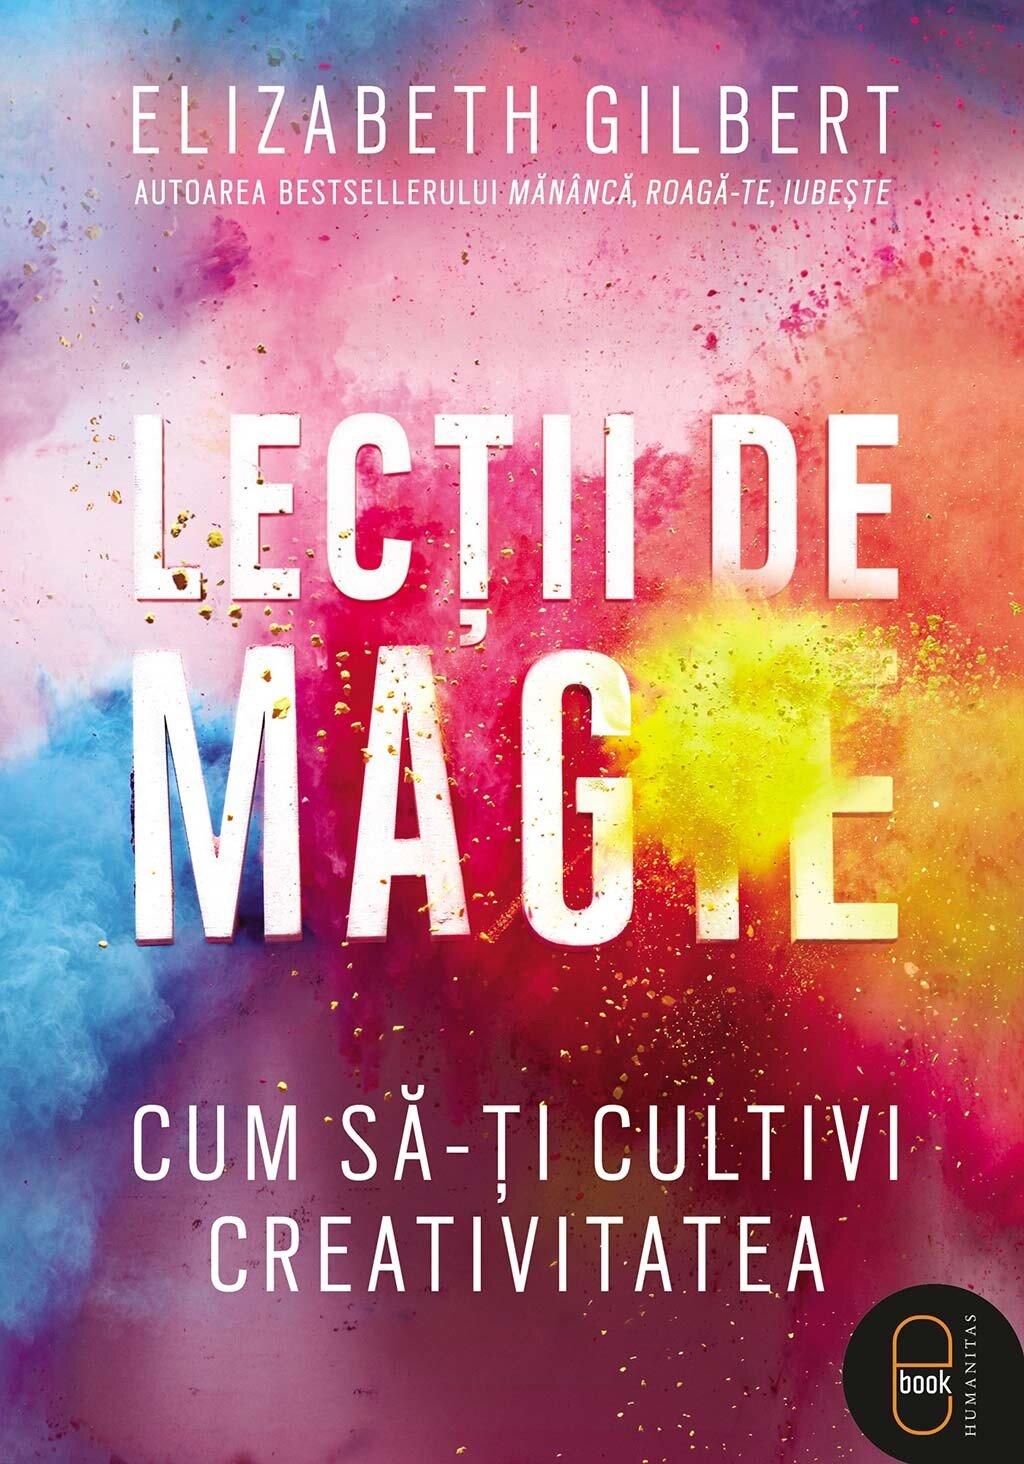 Lectii de magie. Cum sa-ti cultivi creativitatea PDF (Download eBook)